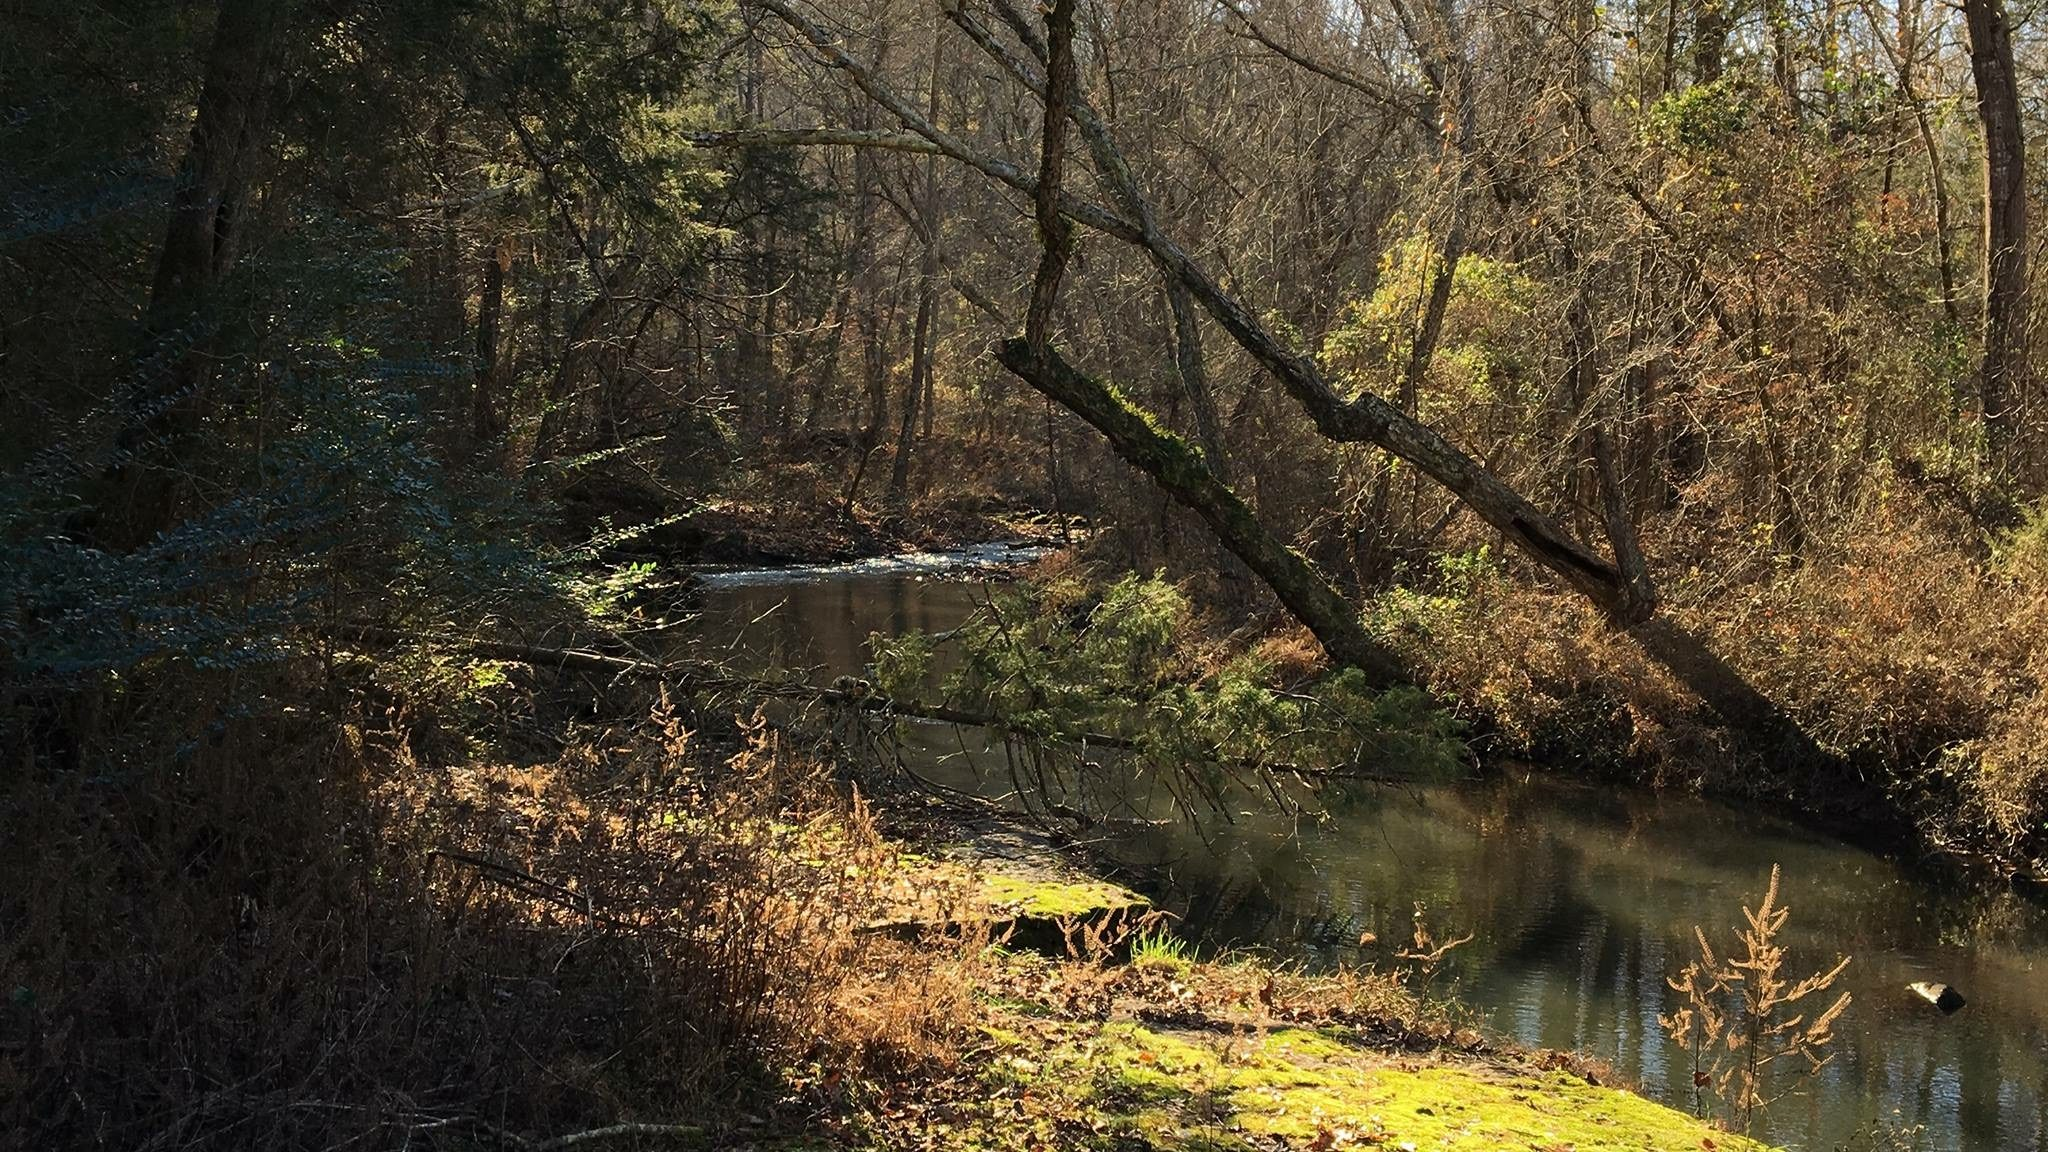 Isabel Creek runs past Tobias Wray's Arkansas home